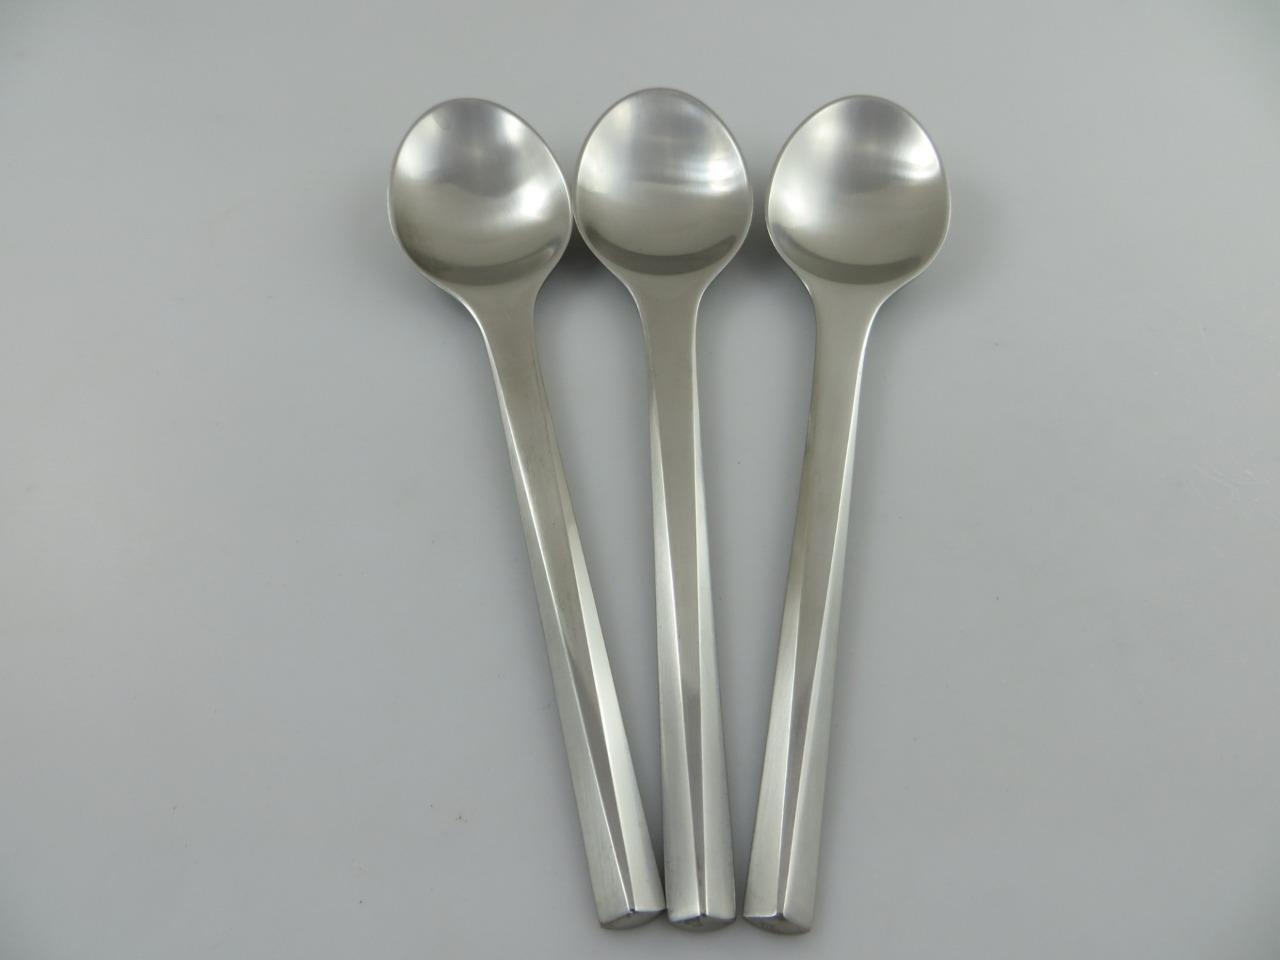 3 Teaspoons PRISM Georg Jensen Stainless Steel Flatware Denmark 6-1 4